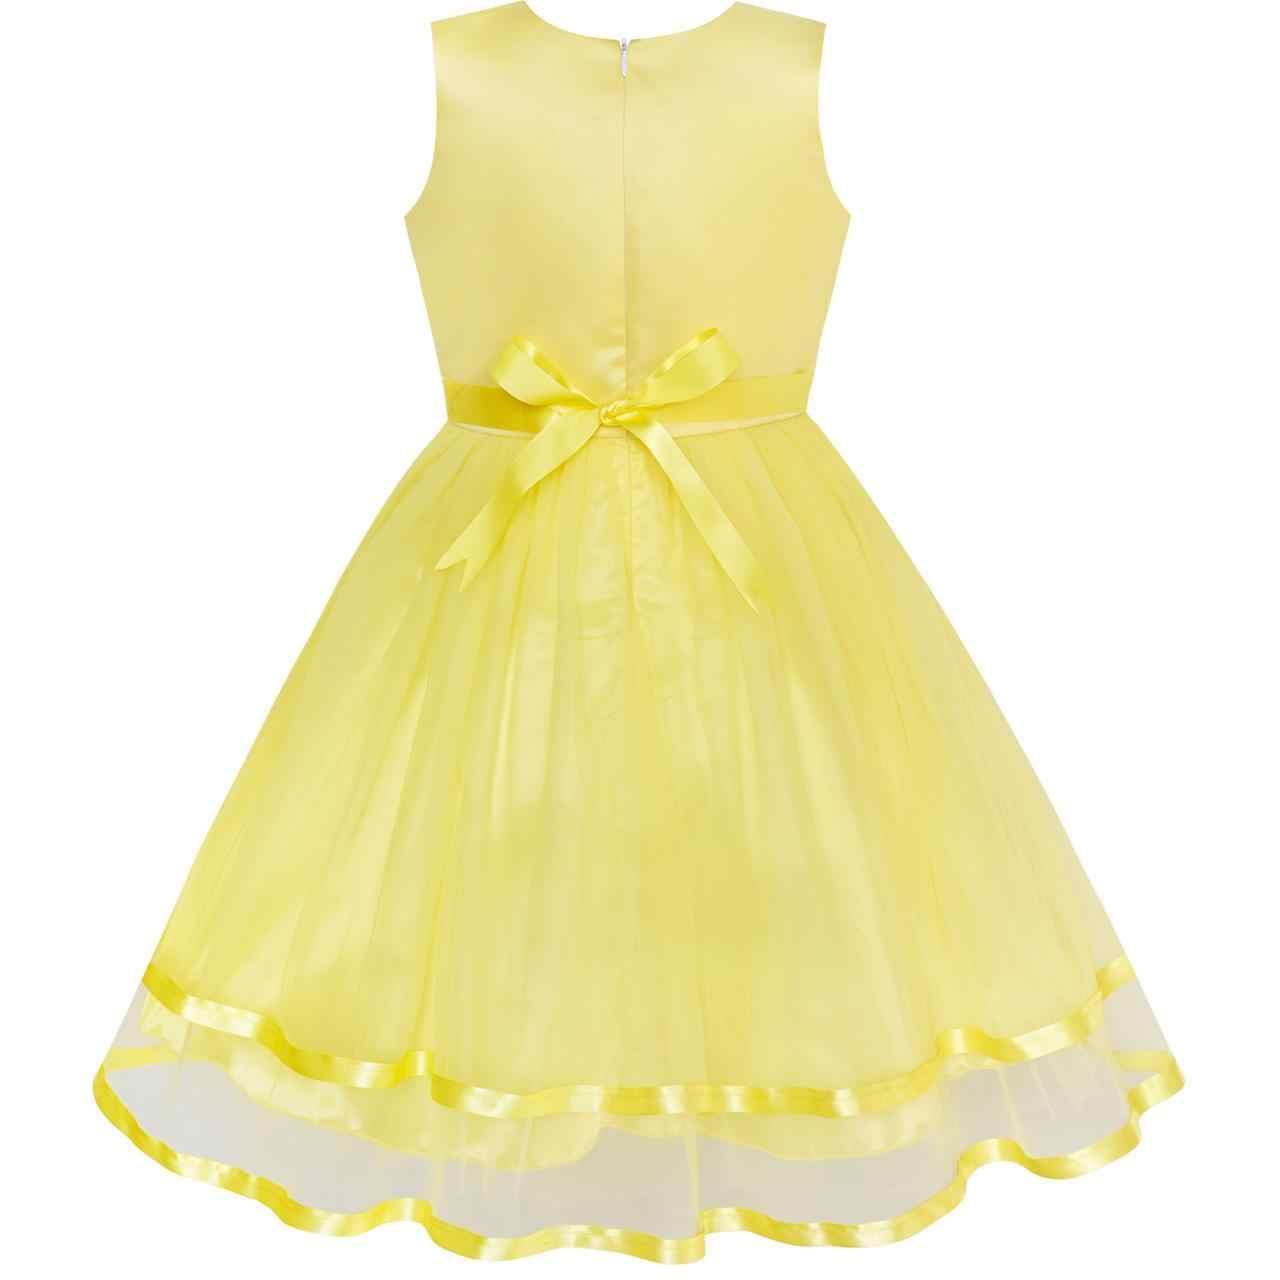 Sunny Fashion ملابس أطفال بنات زهرة فتاة فستان أصفر مربوط زفاف حفلة إشبينة العروس